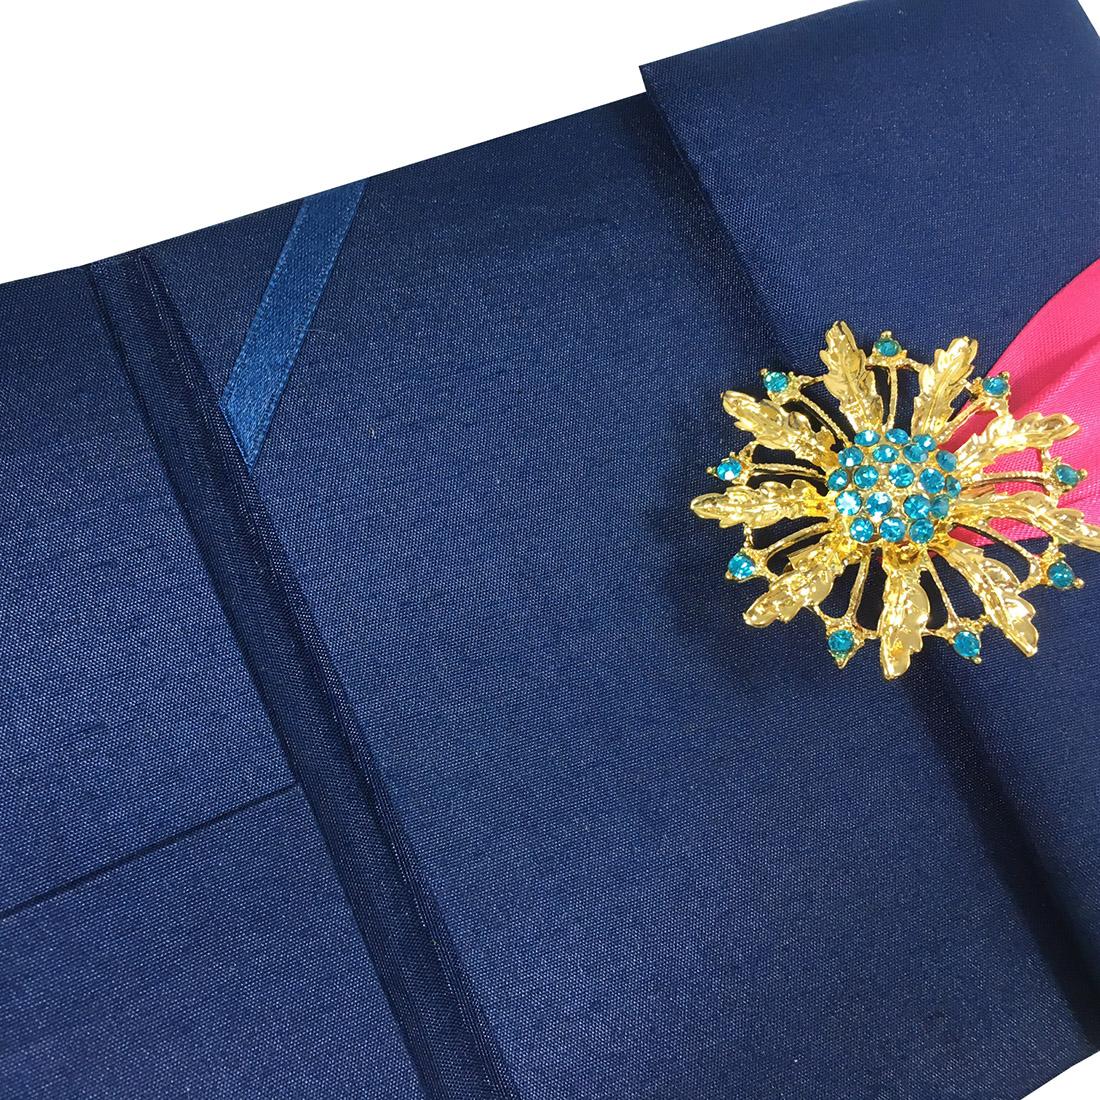 embellished wedding folder